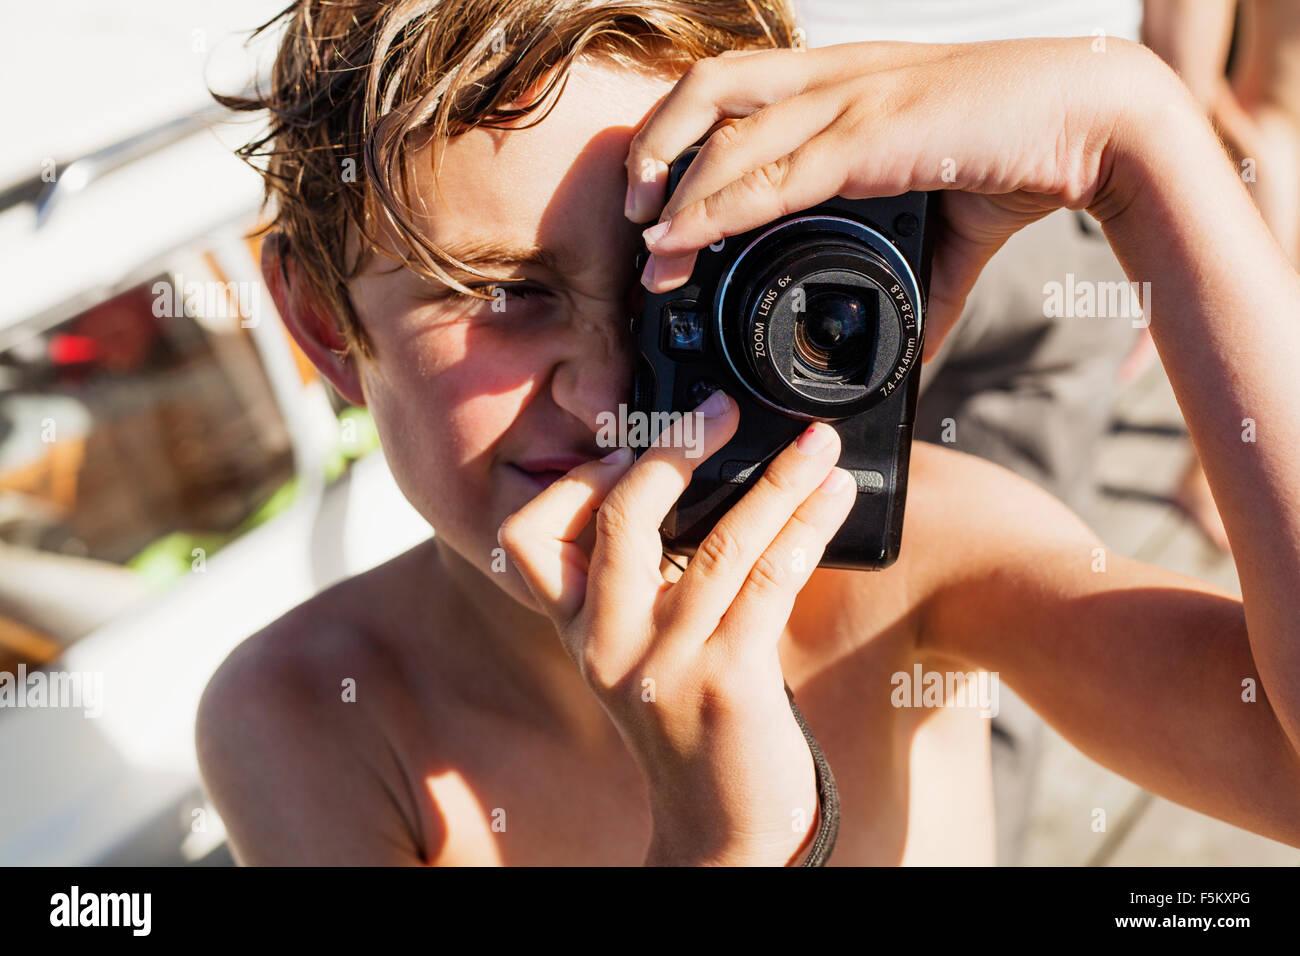 Sweden, Uppland, Runmaro, Barrskar, Portrait of boy (6-7) photographing - Stock Image